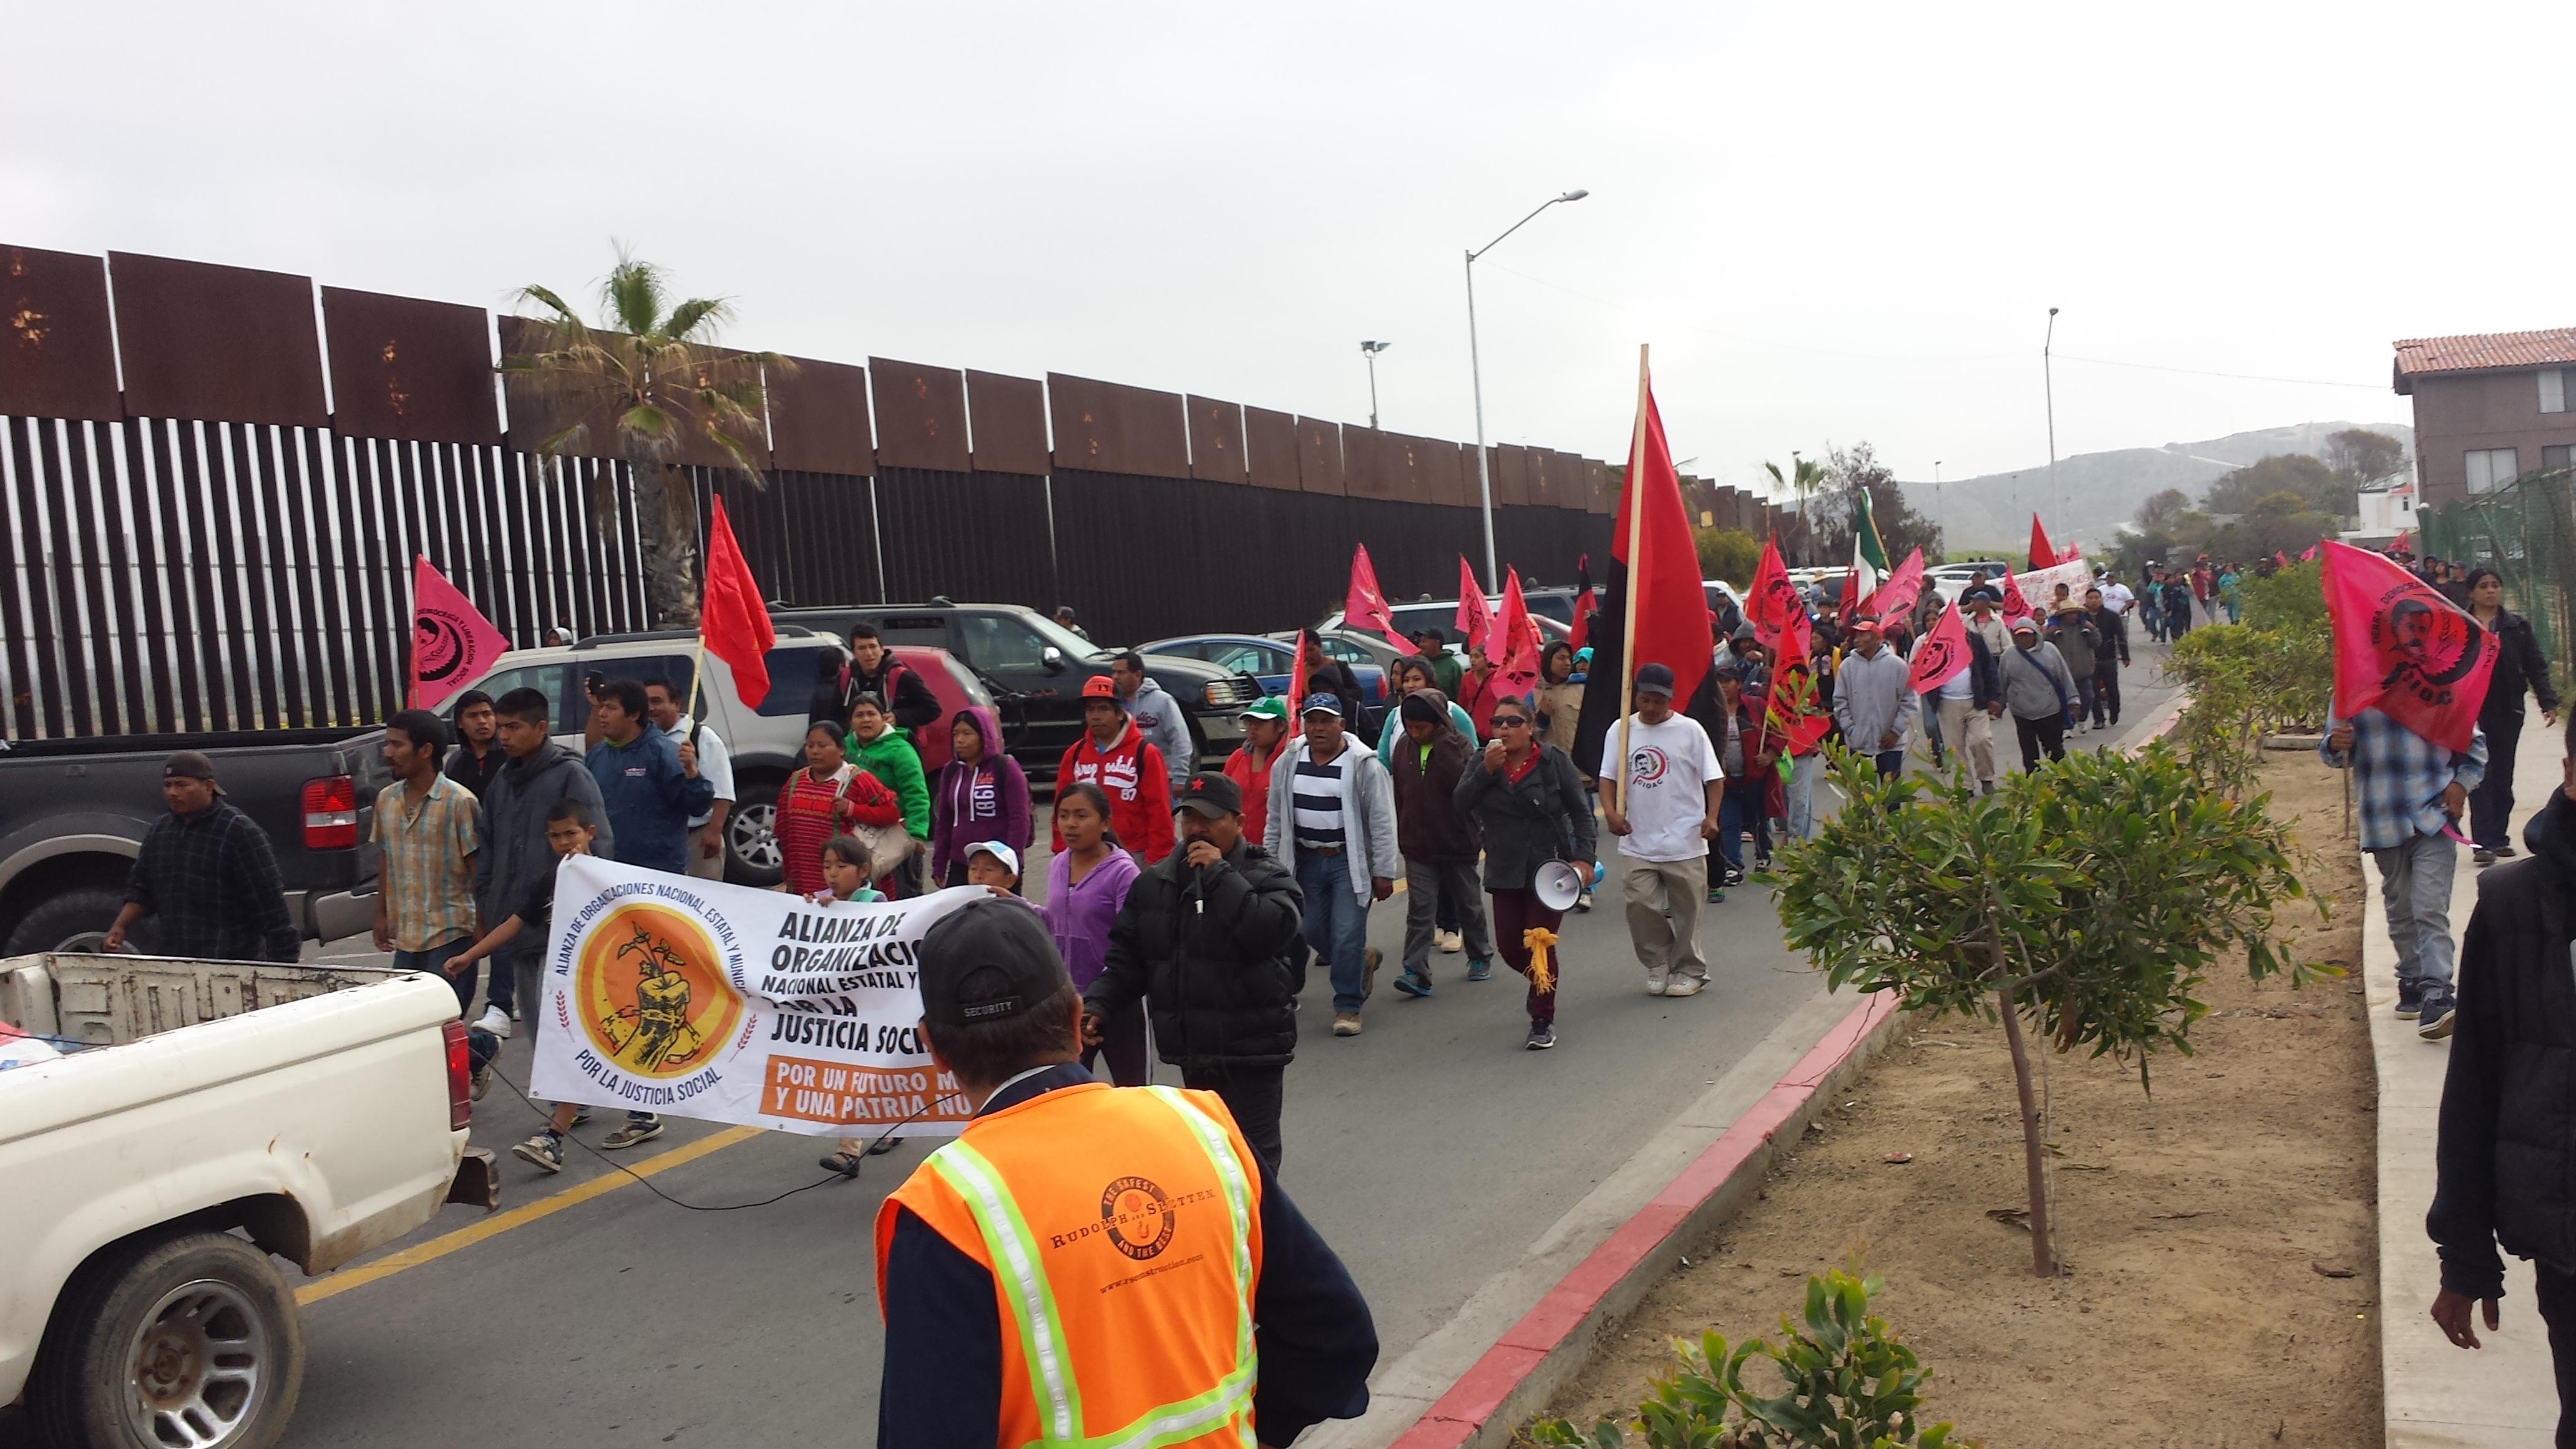 Marcha de jornaleros de San Quintín se acercan por la línea  a Playas de Tijuana. Foto: Rubén Tapia.